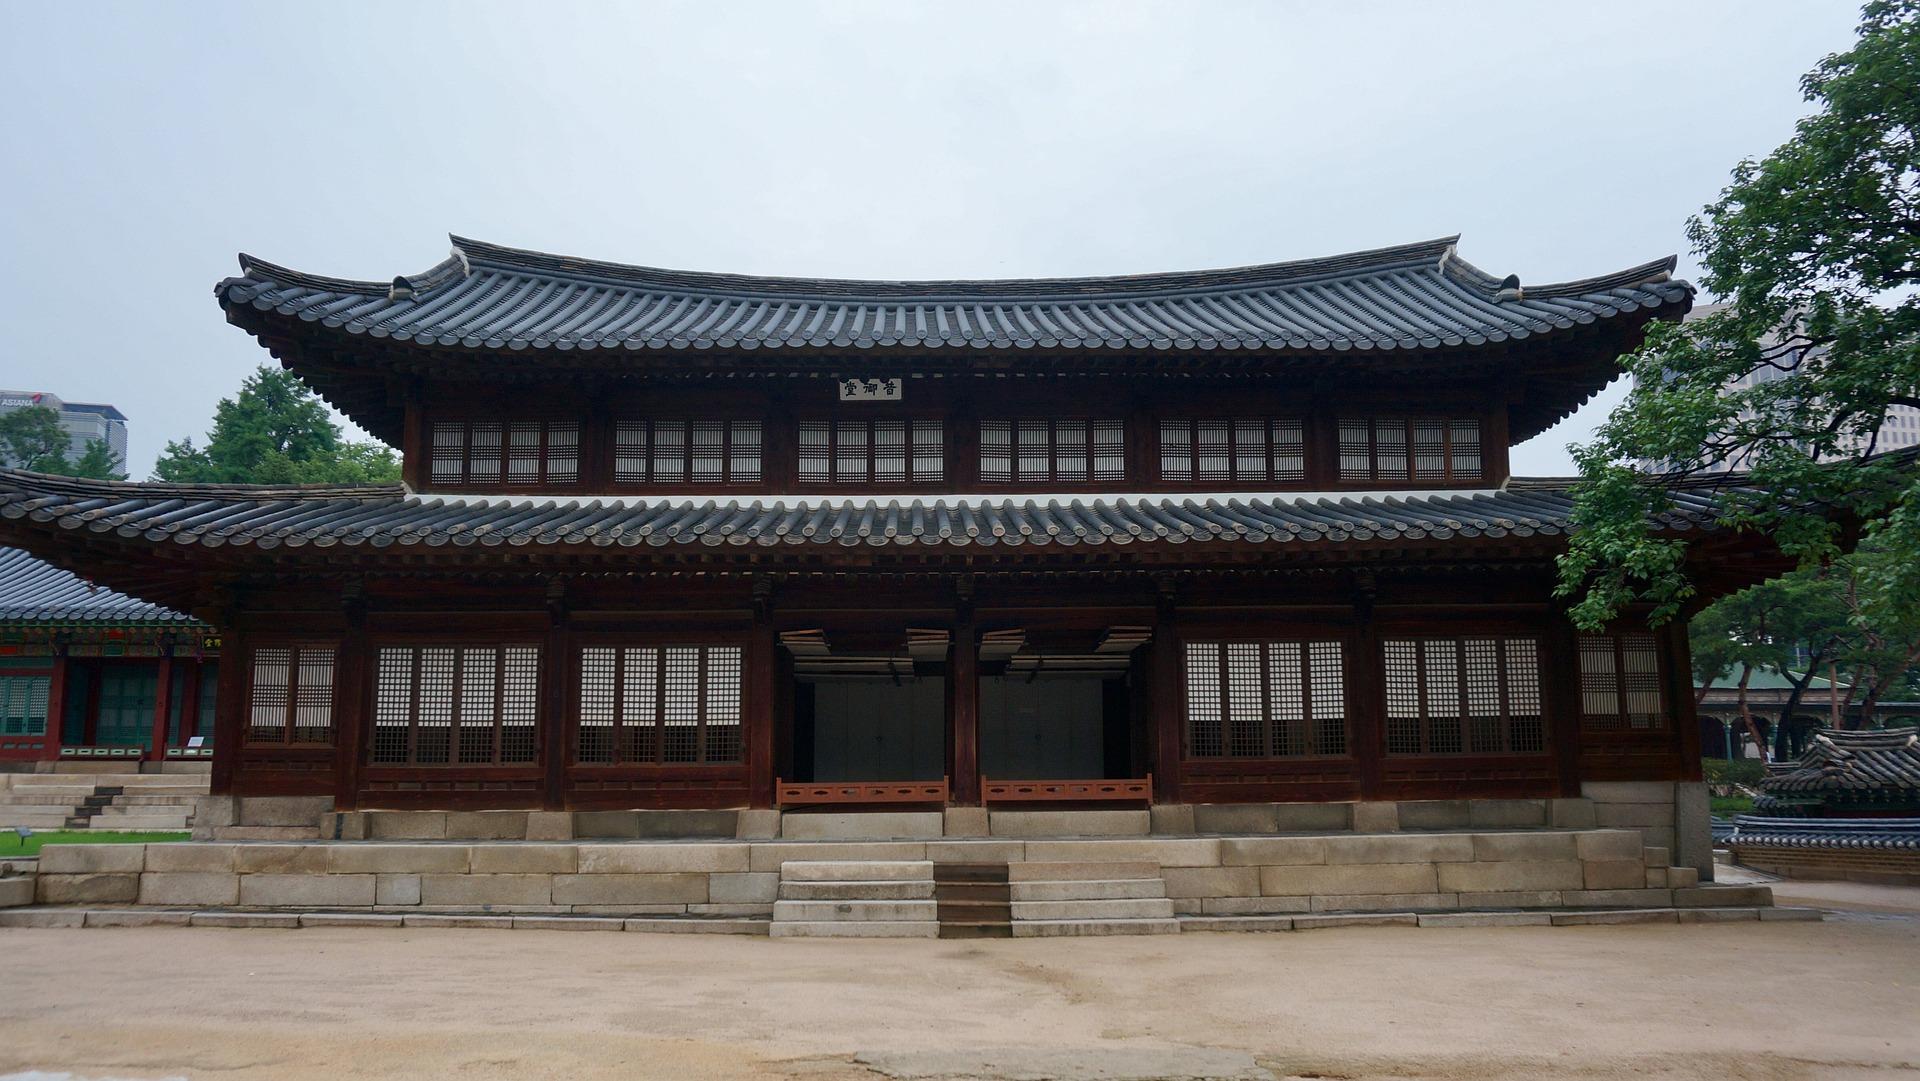 landmark building in South Korea